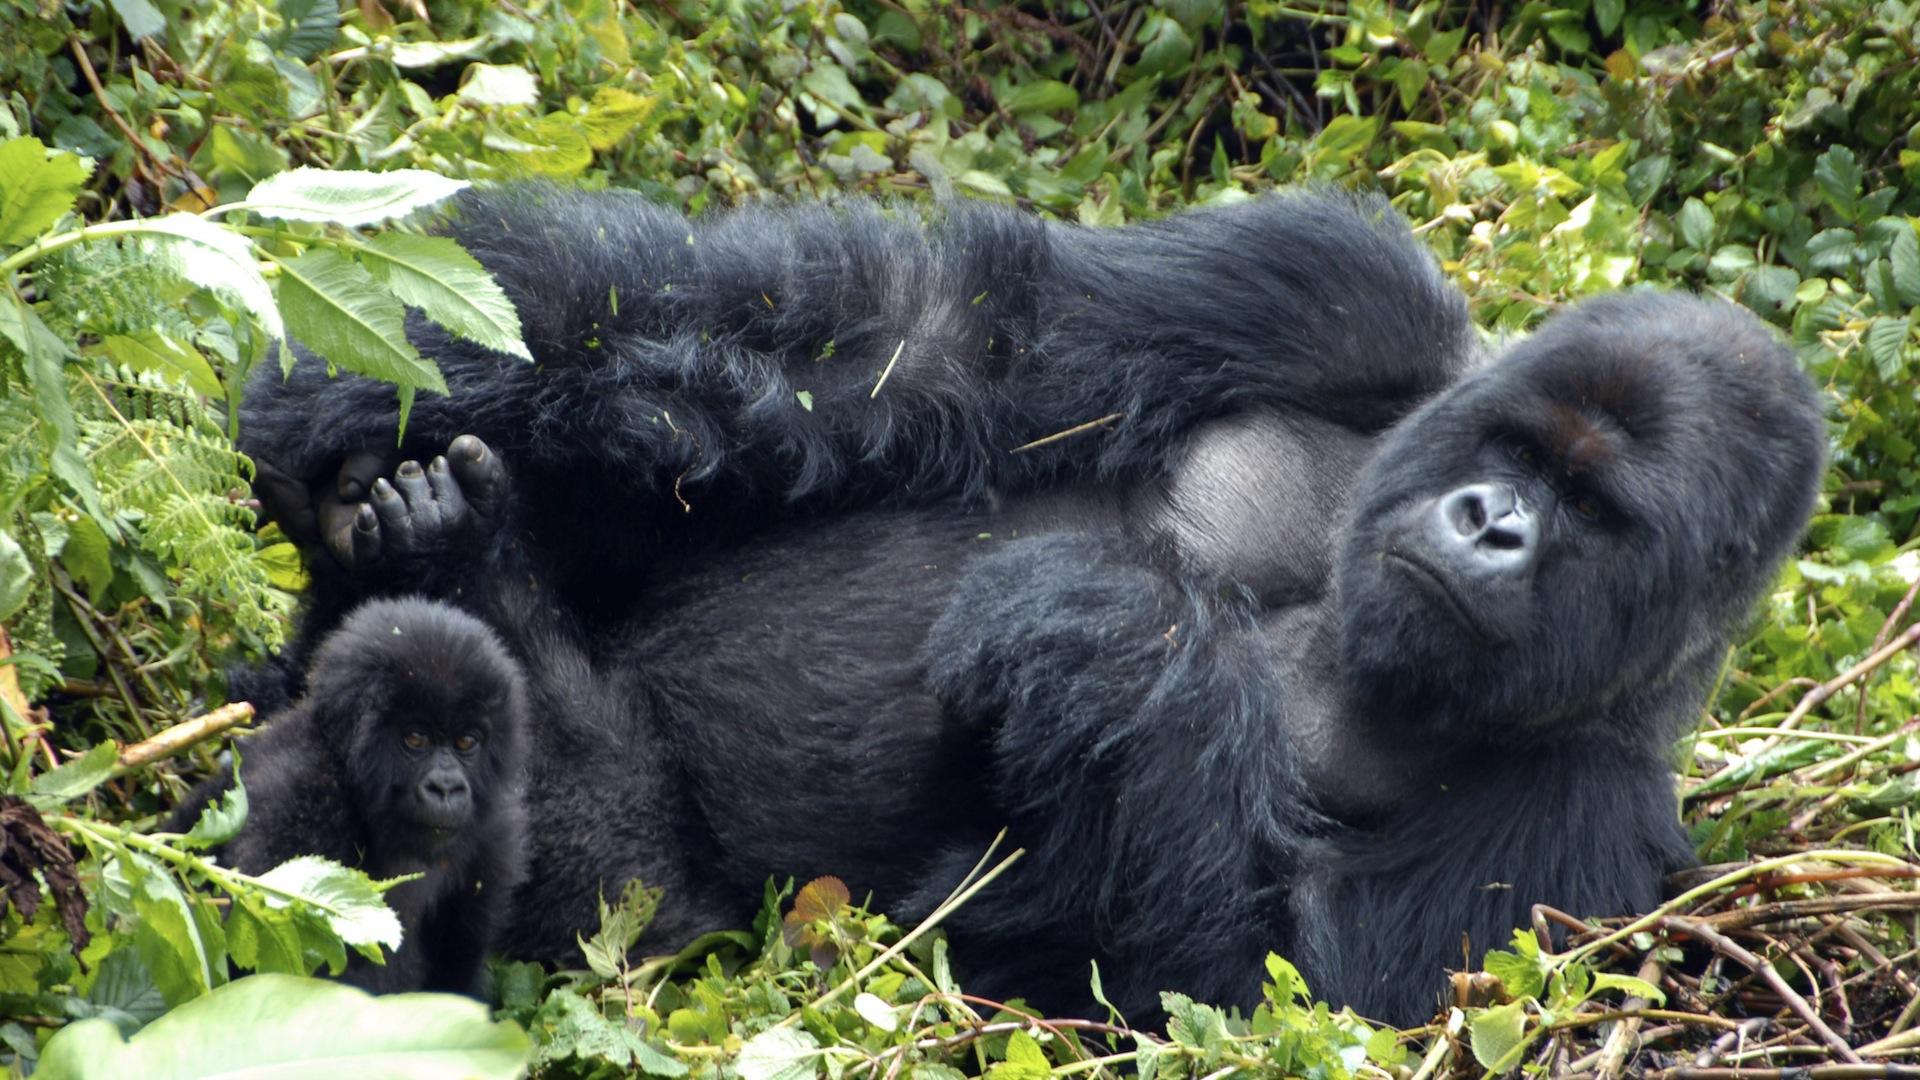 gorilla research paper